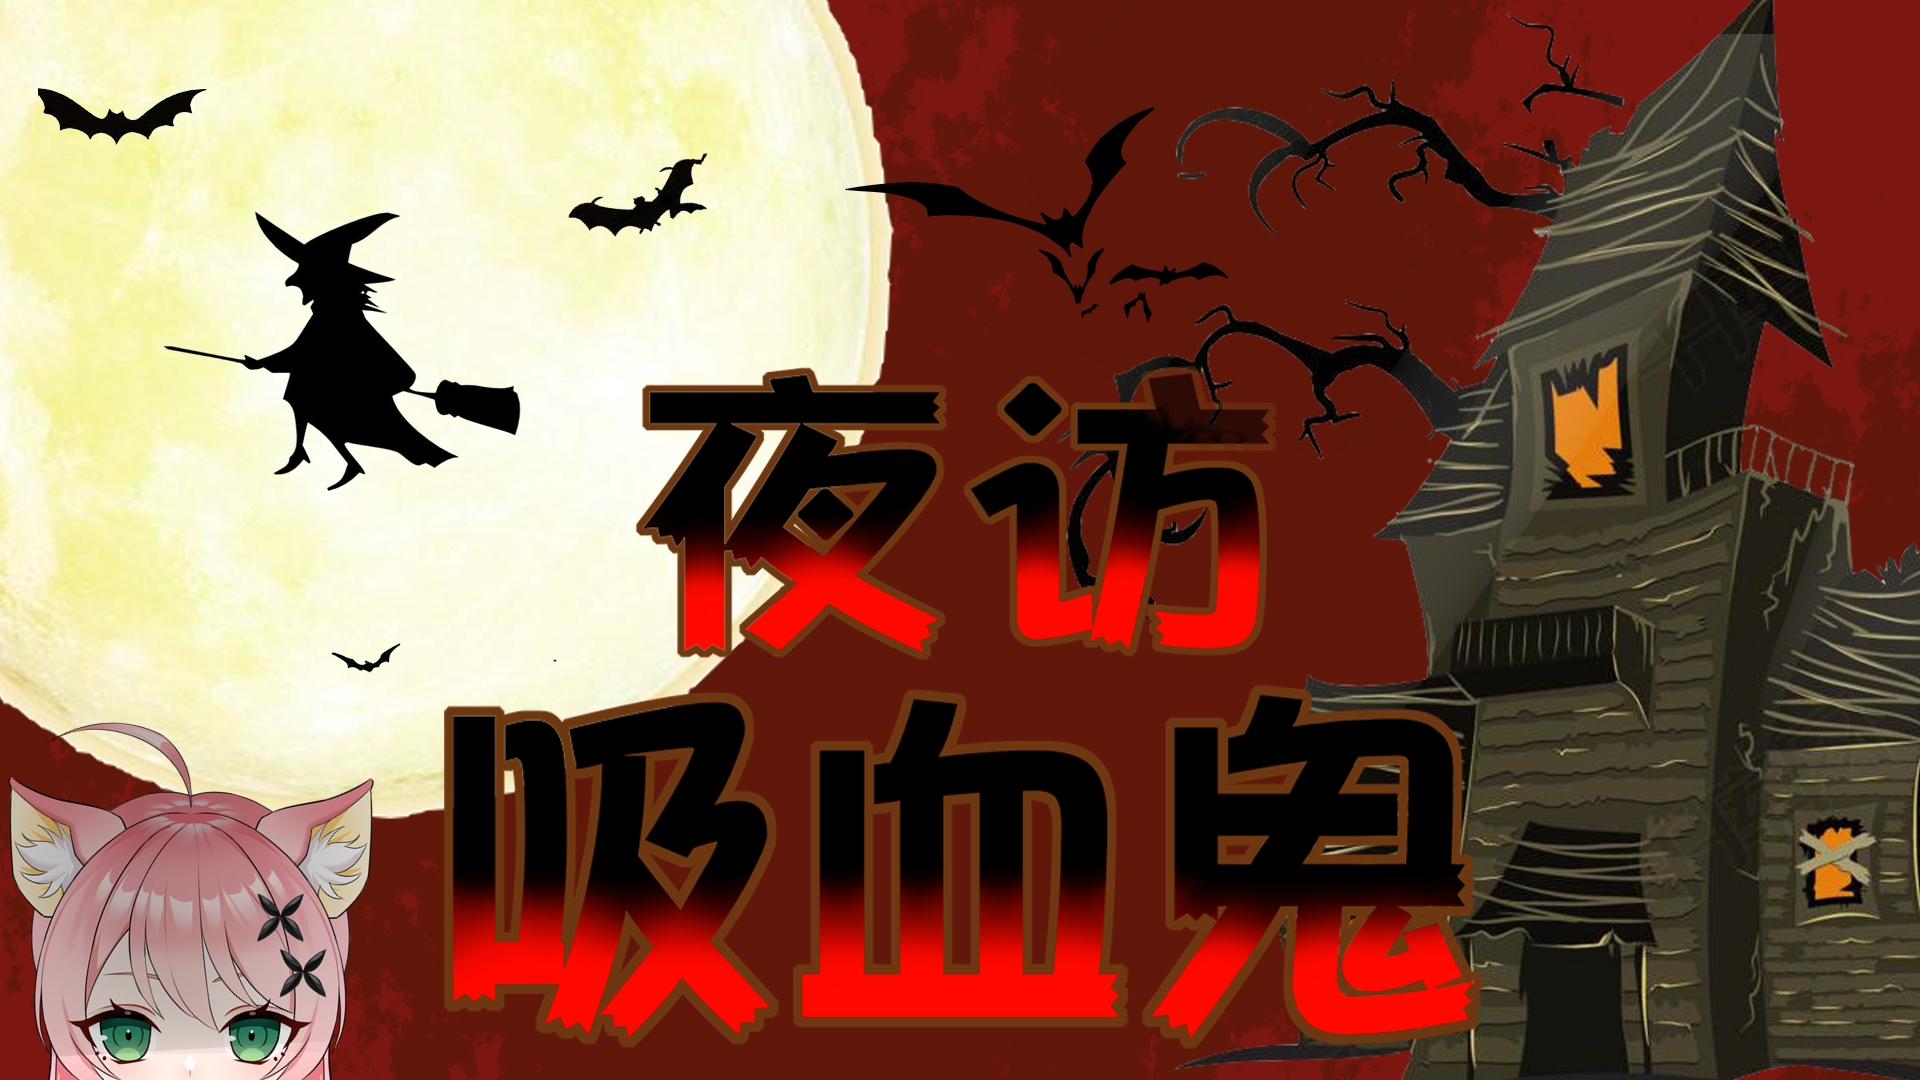 【VUP万圣祭】✚夜访吸血鬼✚快让我尝尝血的滋味